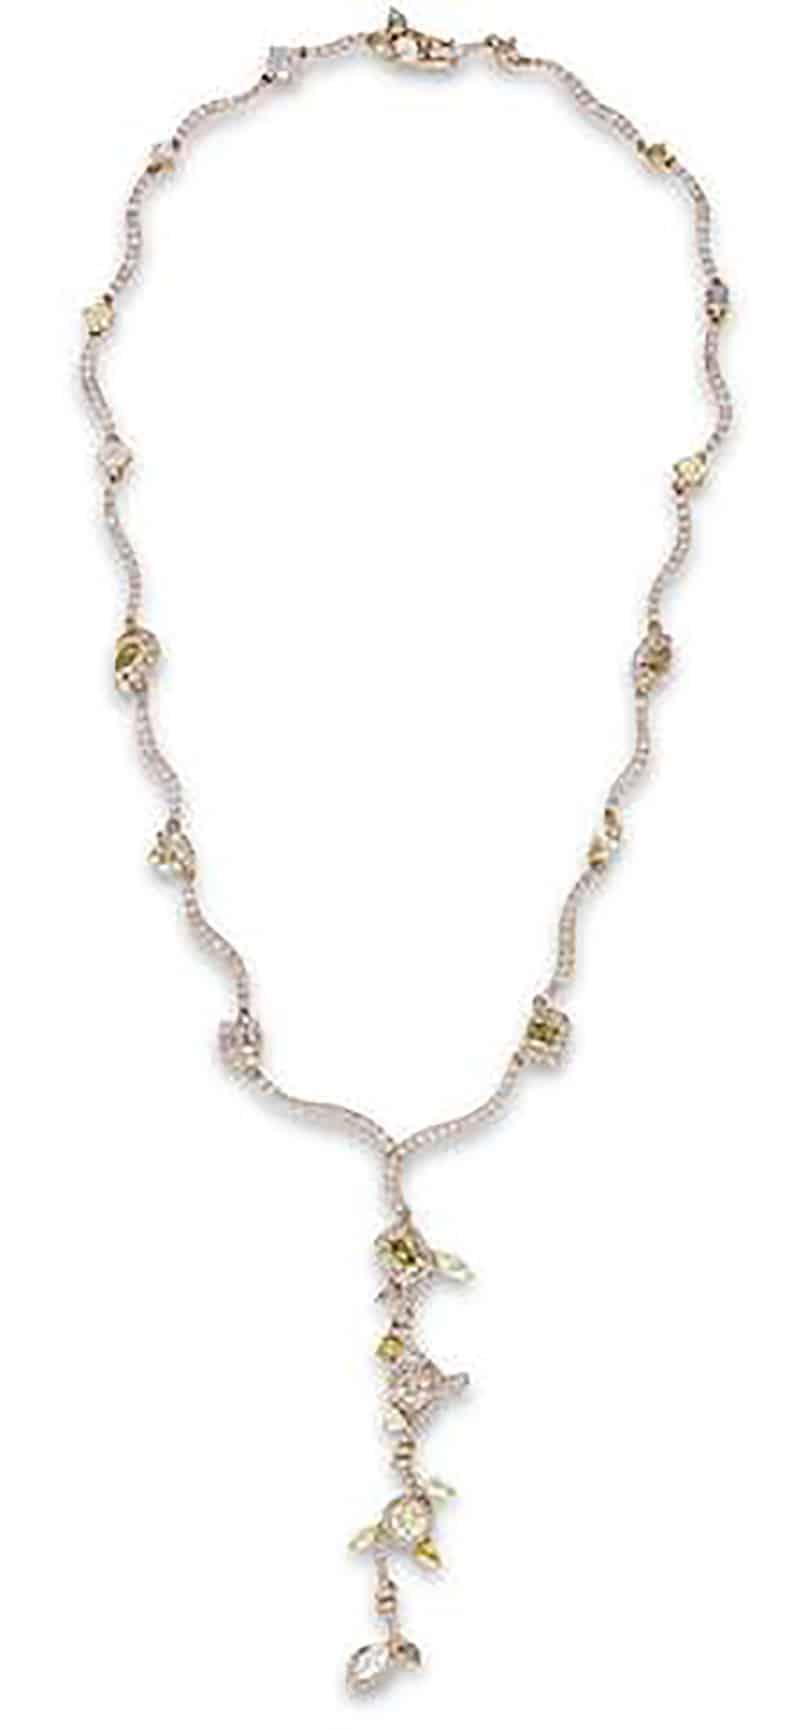 LOT 651 - A FANCY COLOURED DIAMOND AND DIAMOND NECKLACE